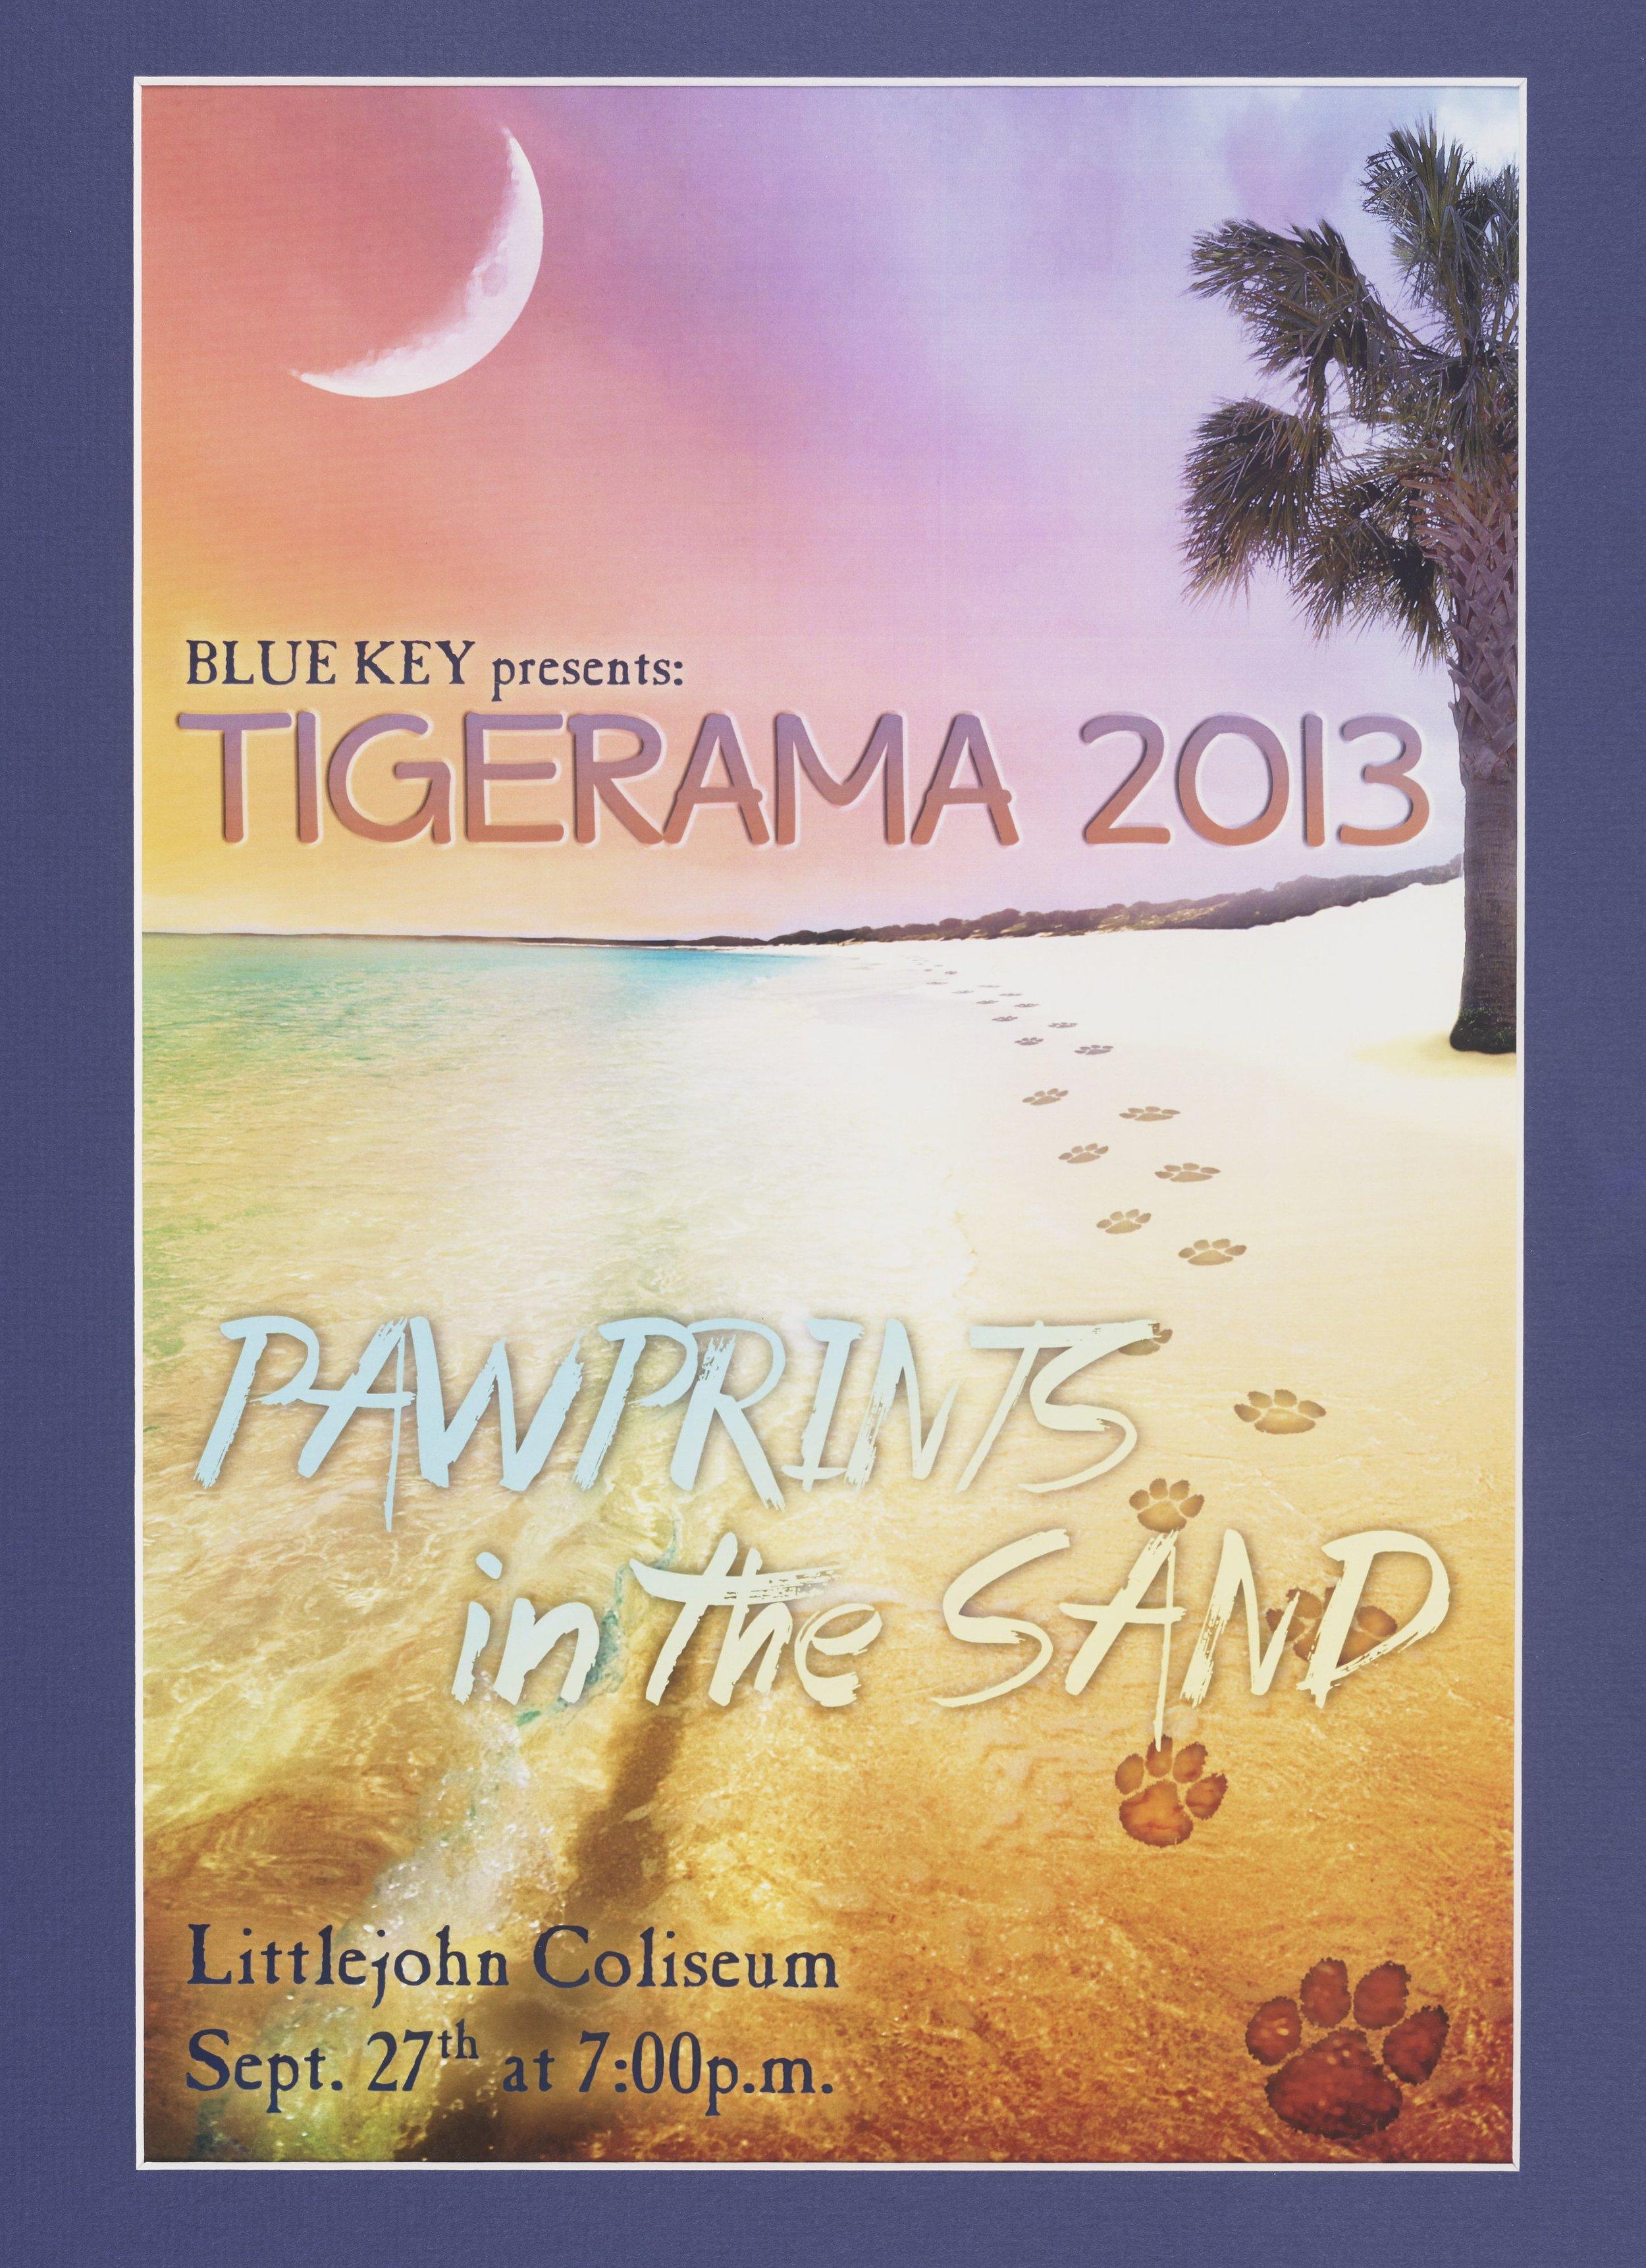 Tigerama 2013